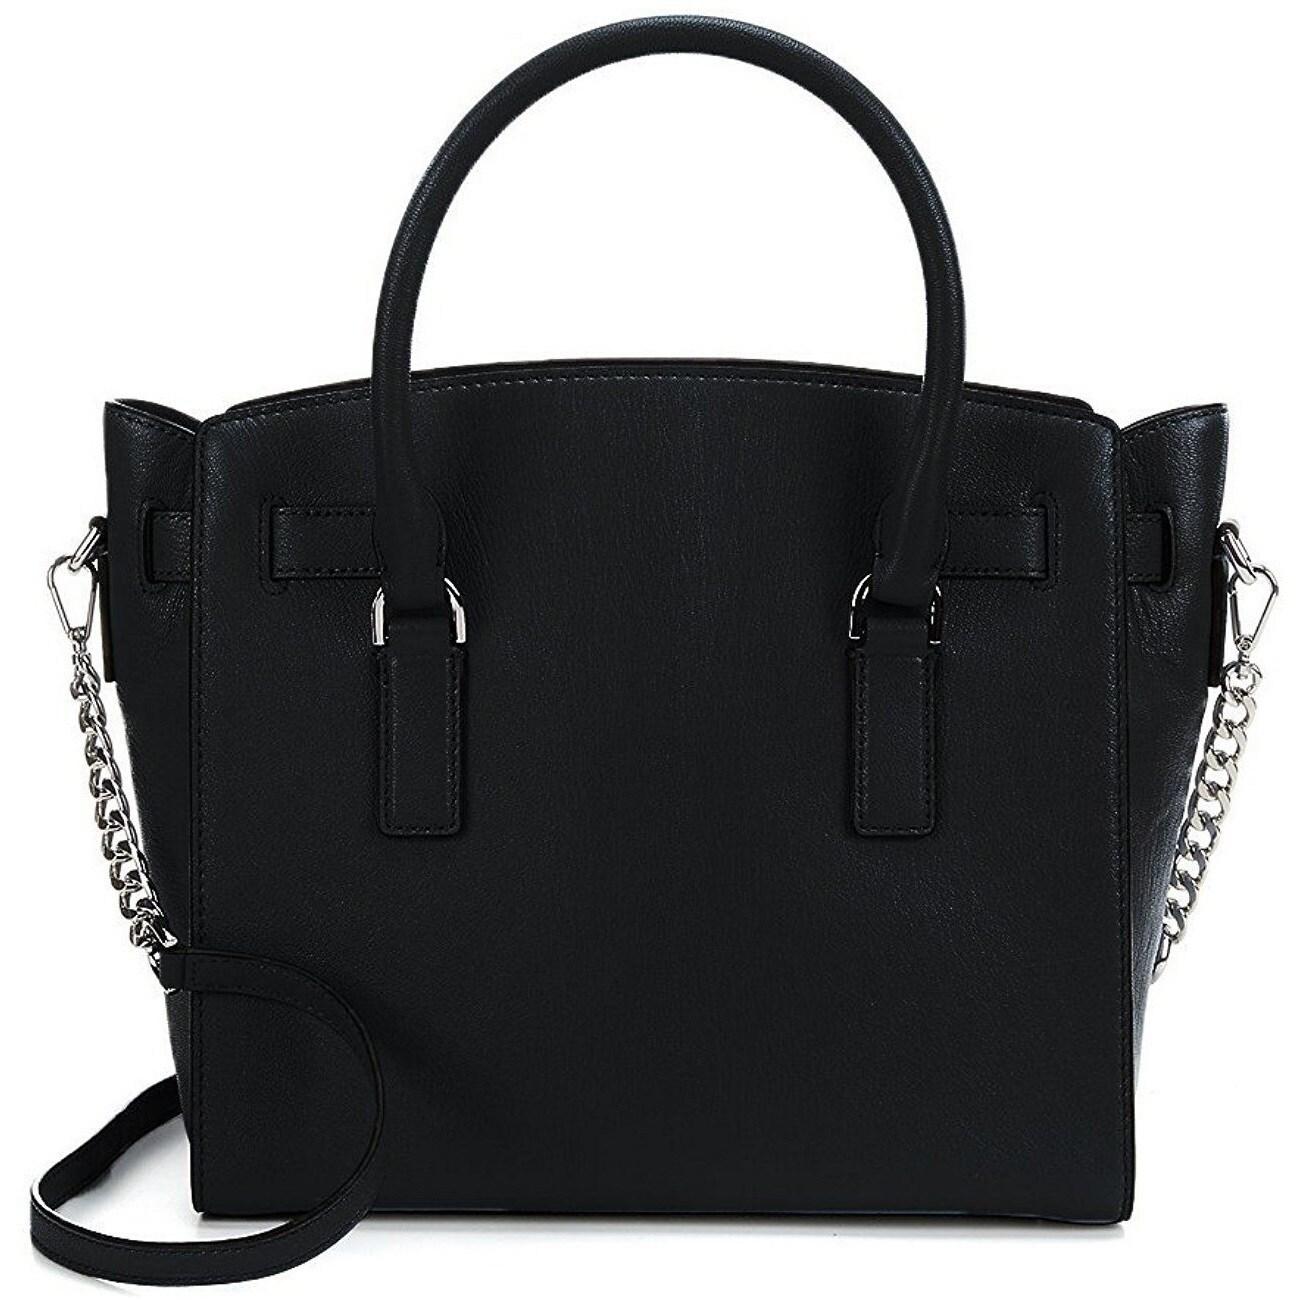 160fbc52ce7f Shop Michael Kors Hamilton Large East West Black Satchel Handbag - Free  Shipping Today - Overstock - 17037414